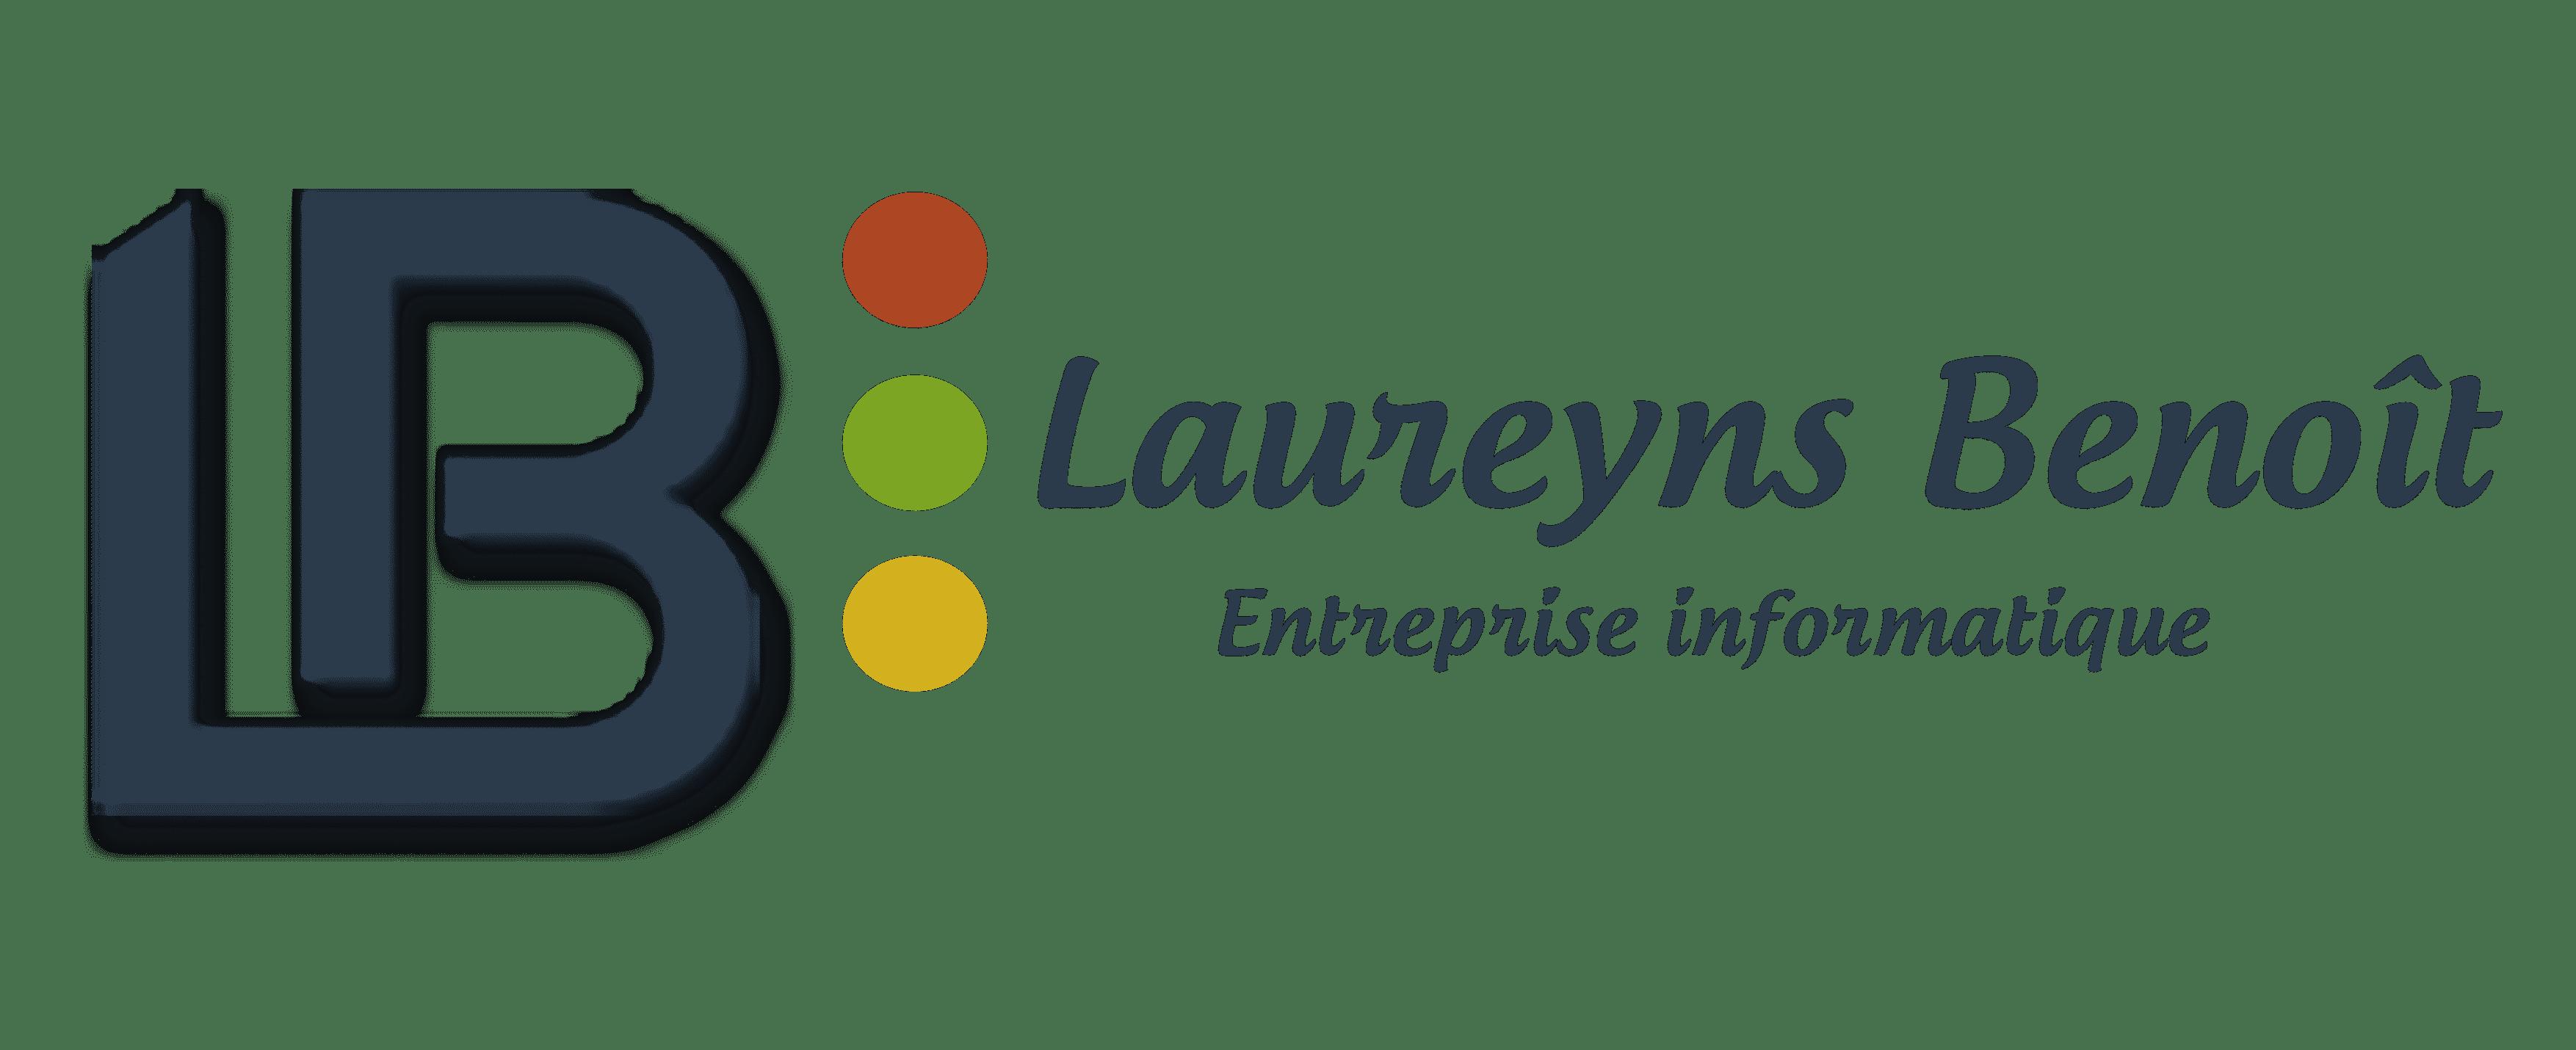 Laureyns Benoît – Entreprise informatique